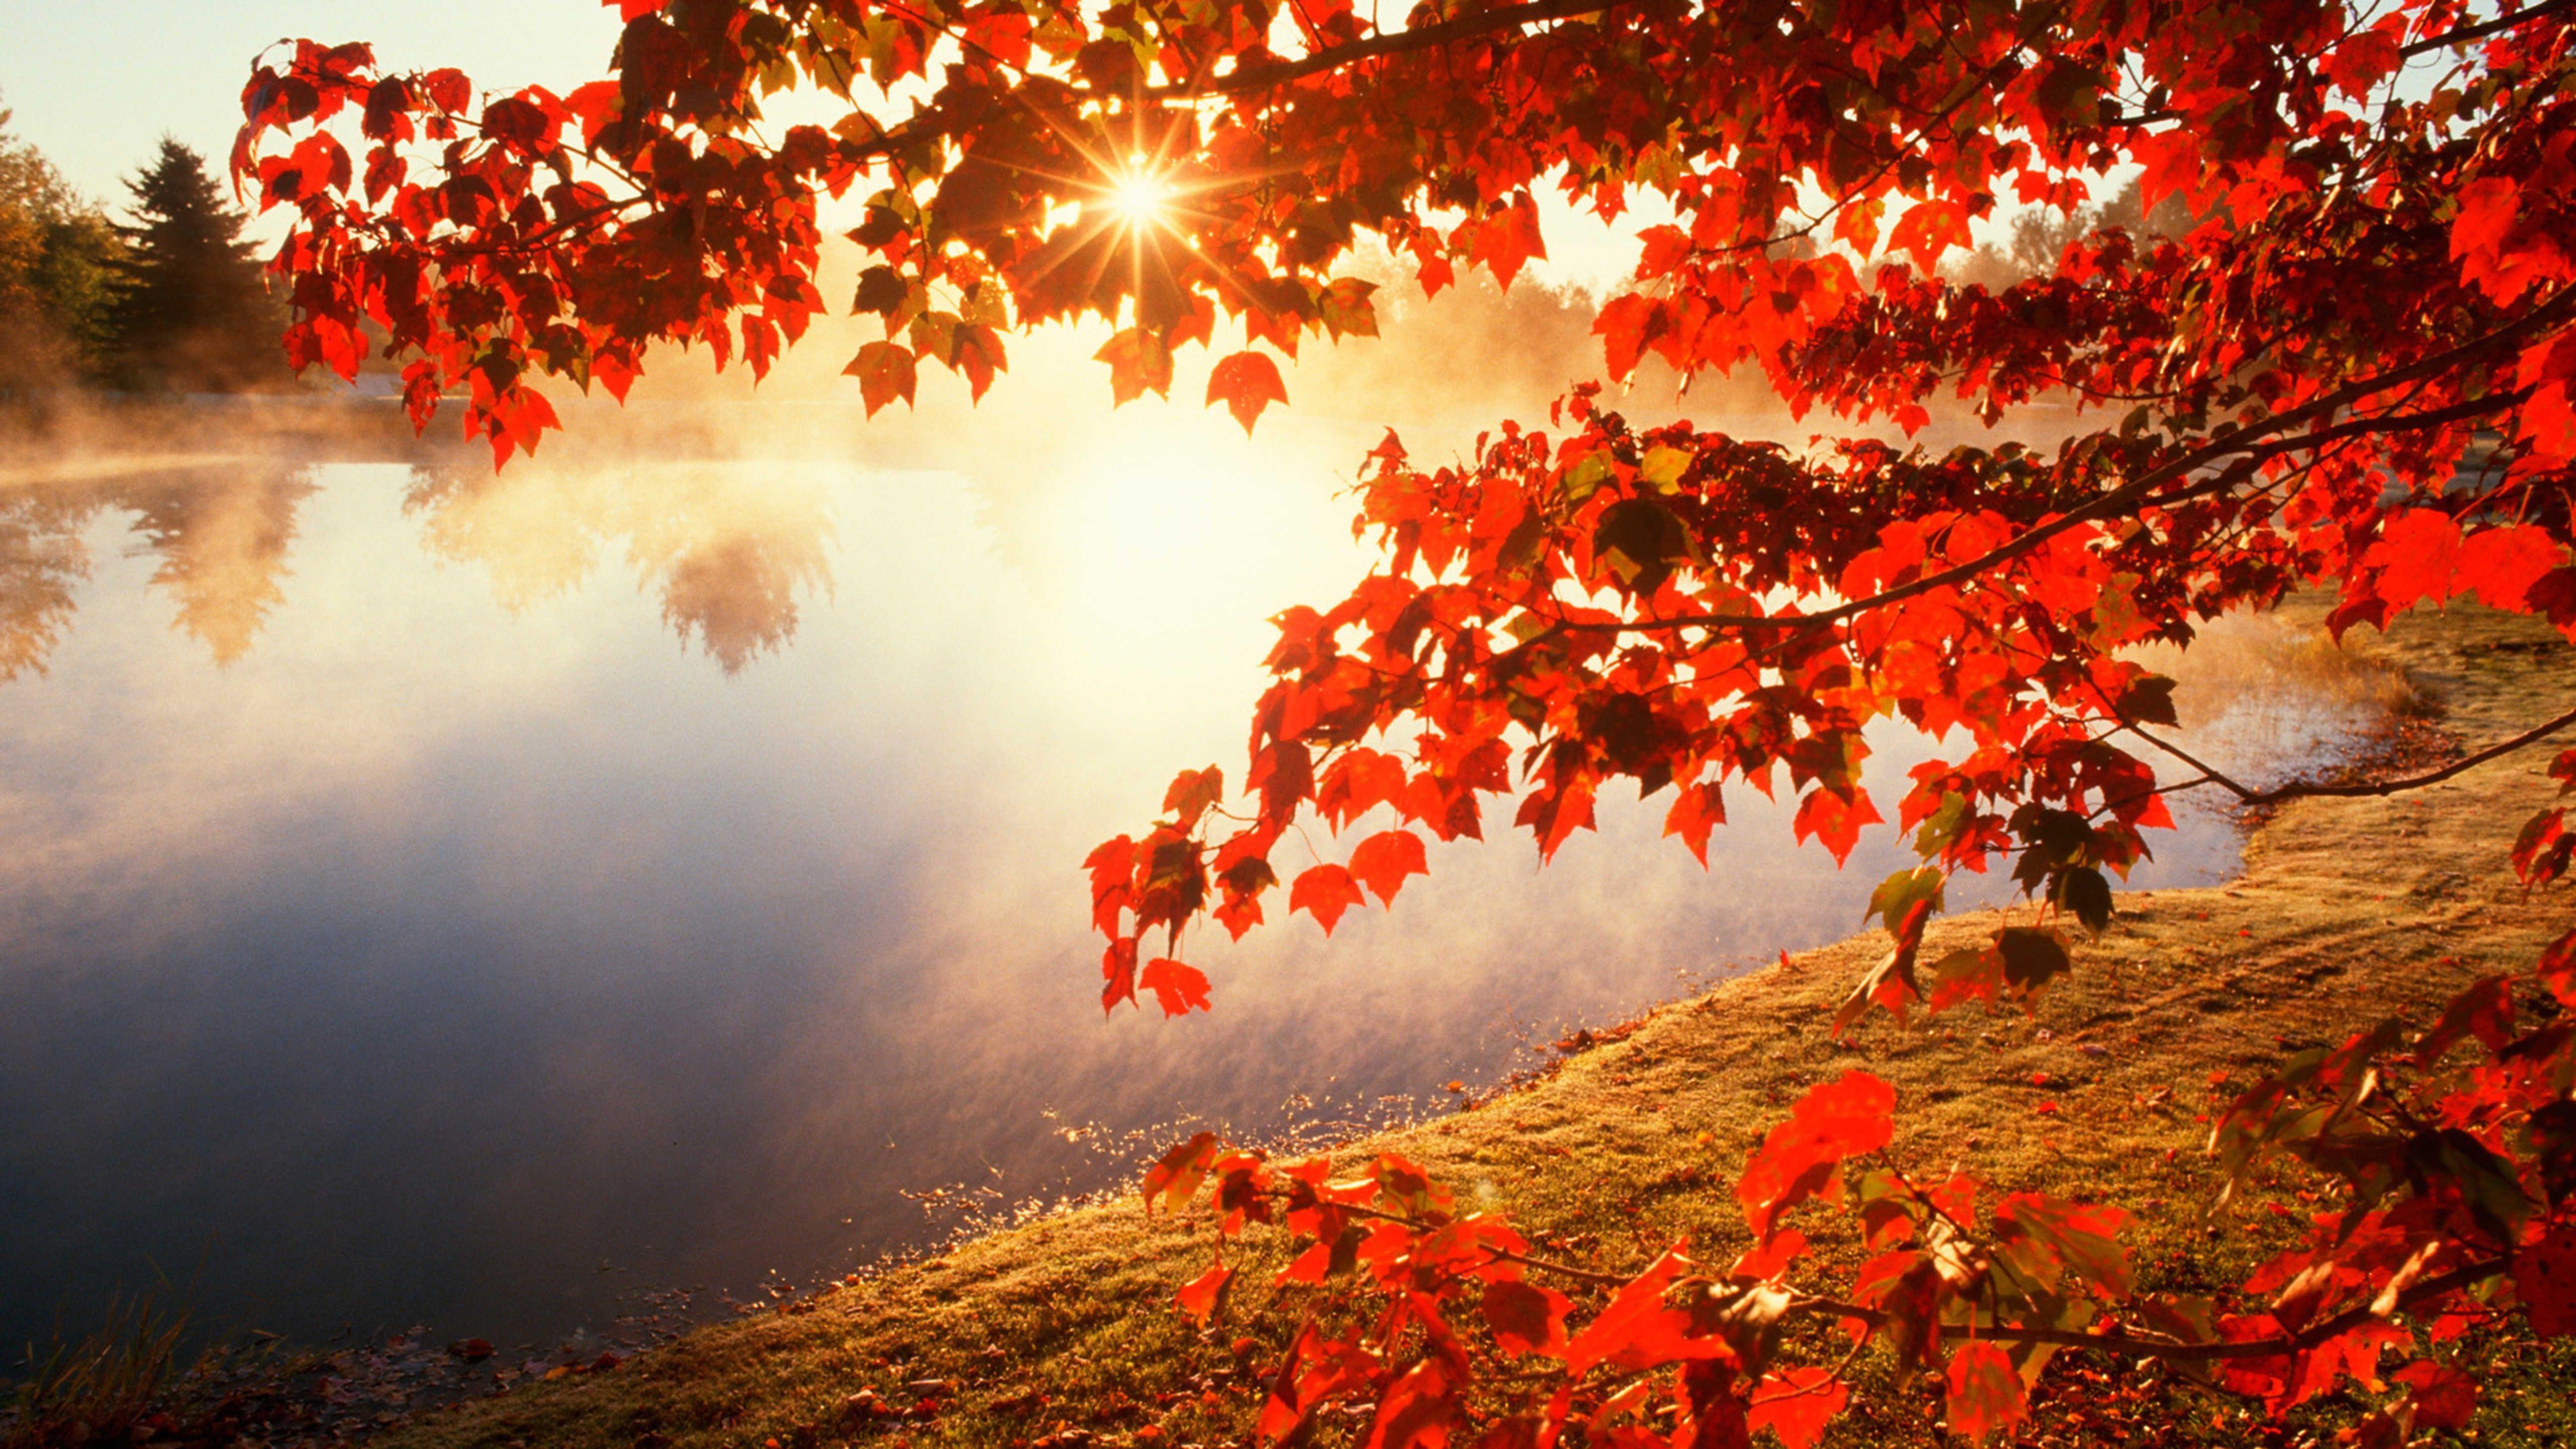 Good Morning Autumn Sunlight Hd Wallpaper Wallpaper Download 5120x2880 In 2020 Autumn Leaves Wallpaper Fall Wallpaper Autumn Wallpaper Hd